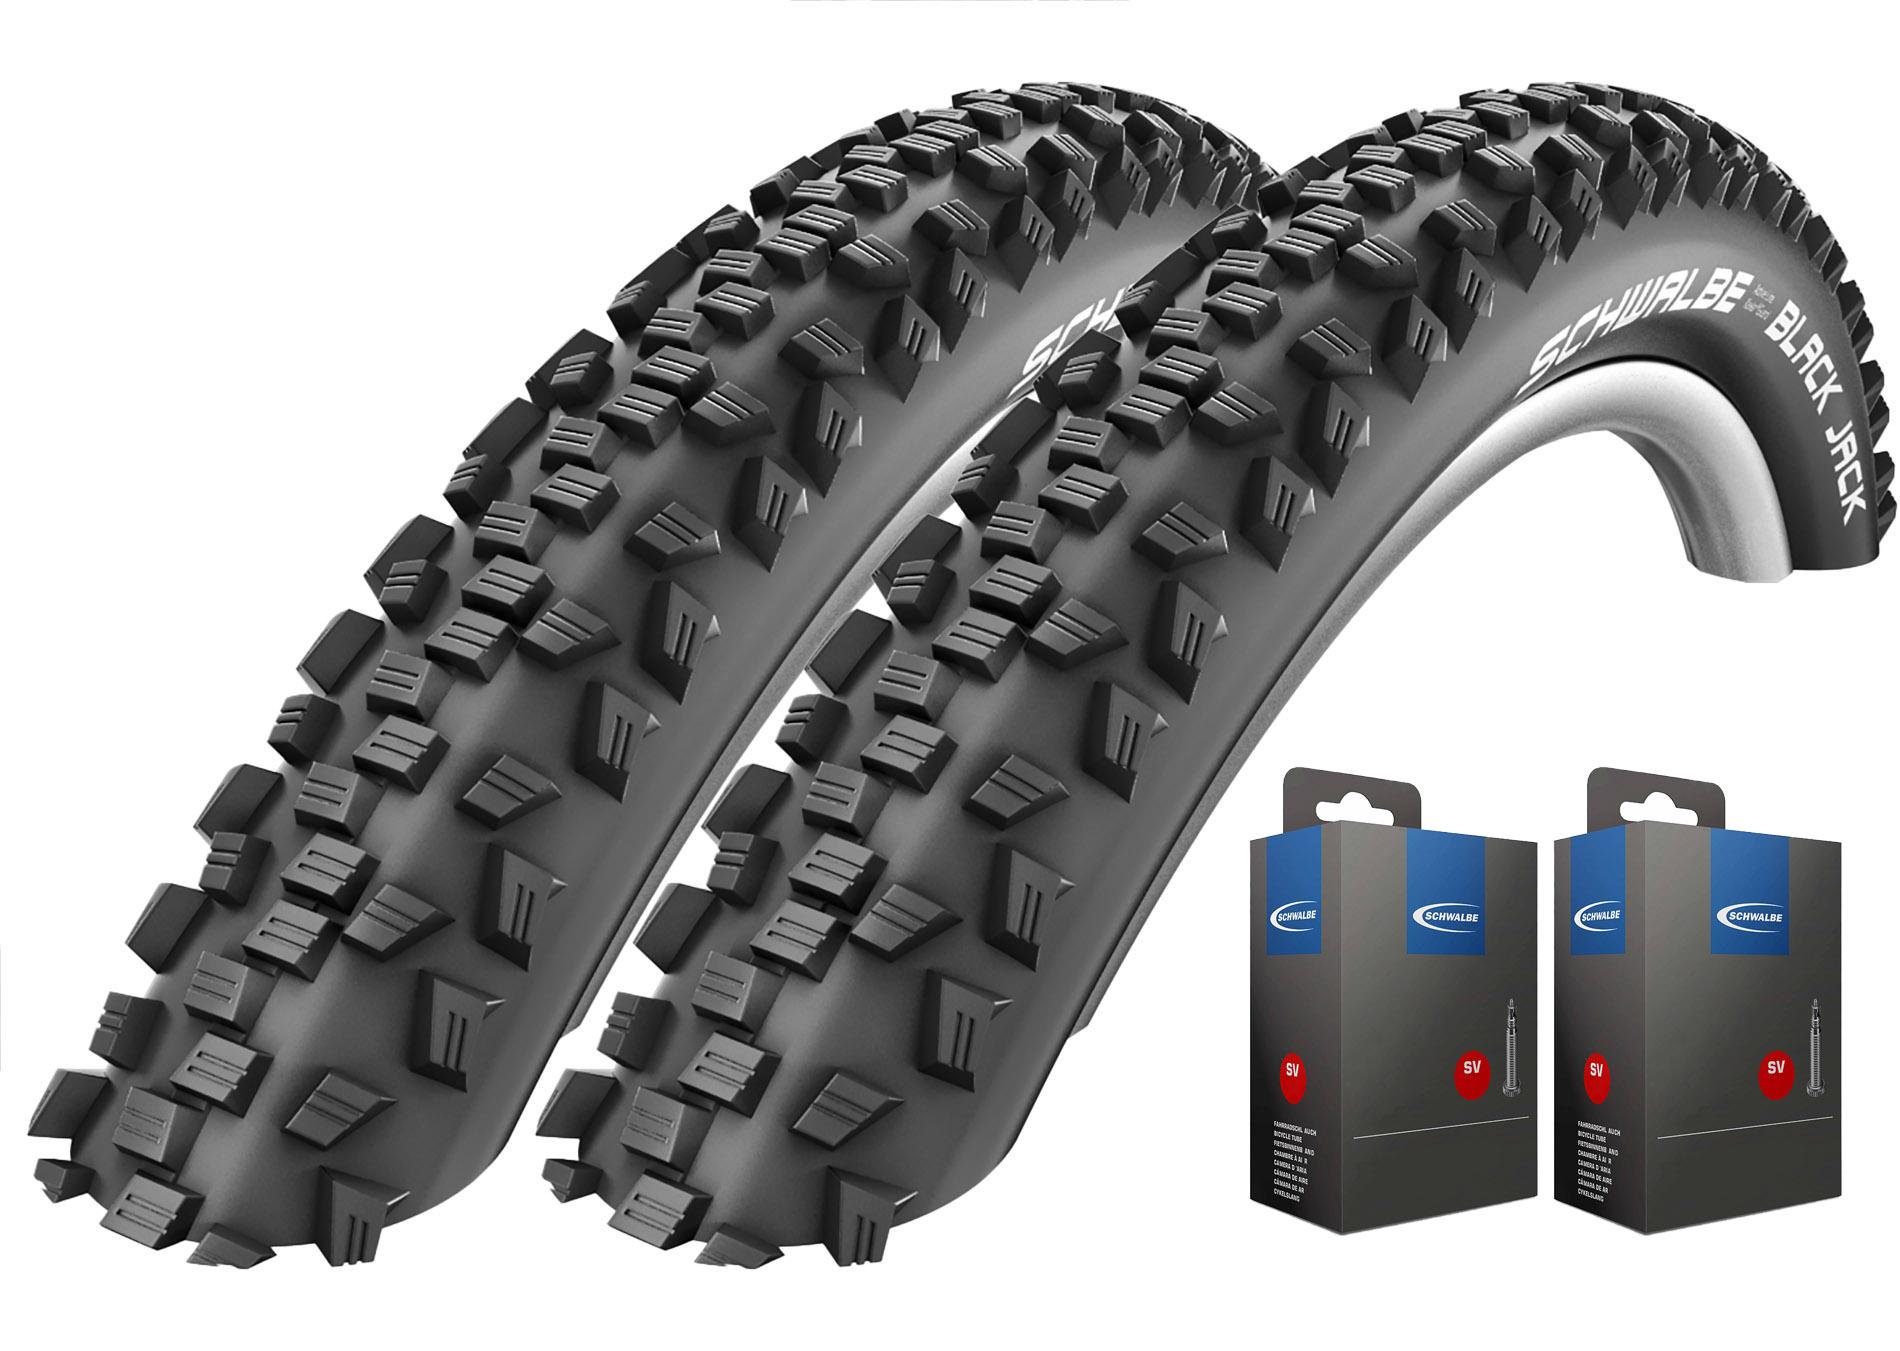 2x Schwalbe Black Jack Fahrrad Reifen 12 16 18 20 24 26 Zoll wählbar KGuard